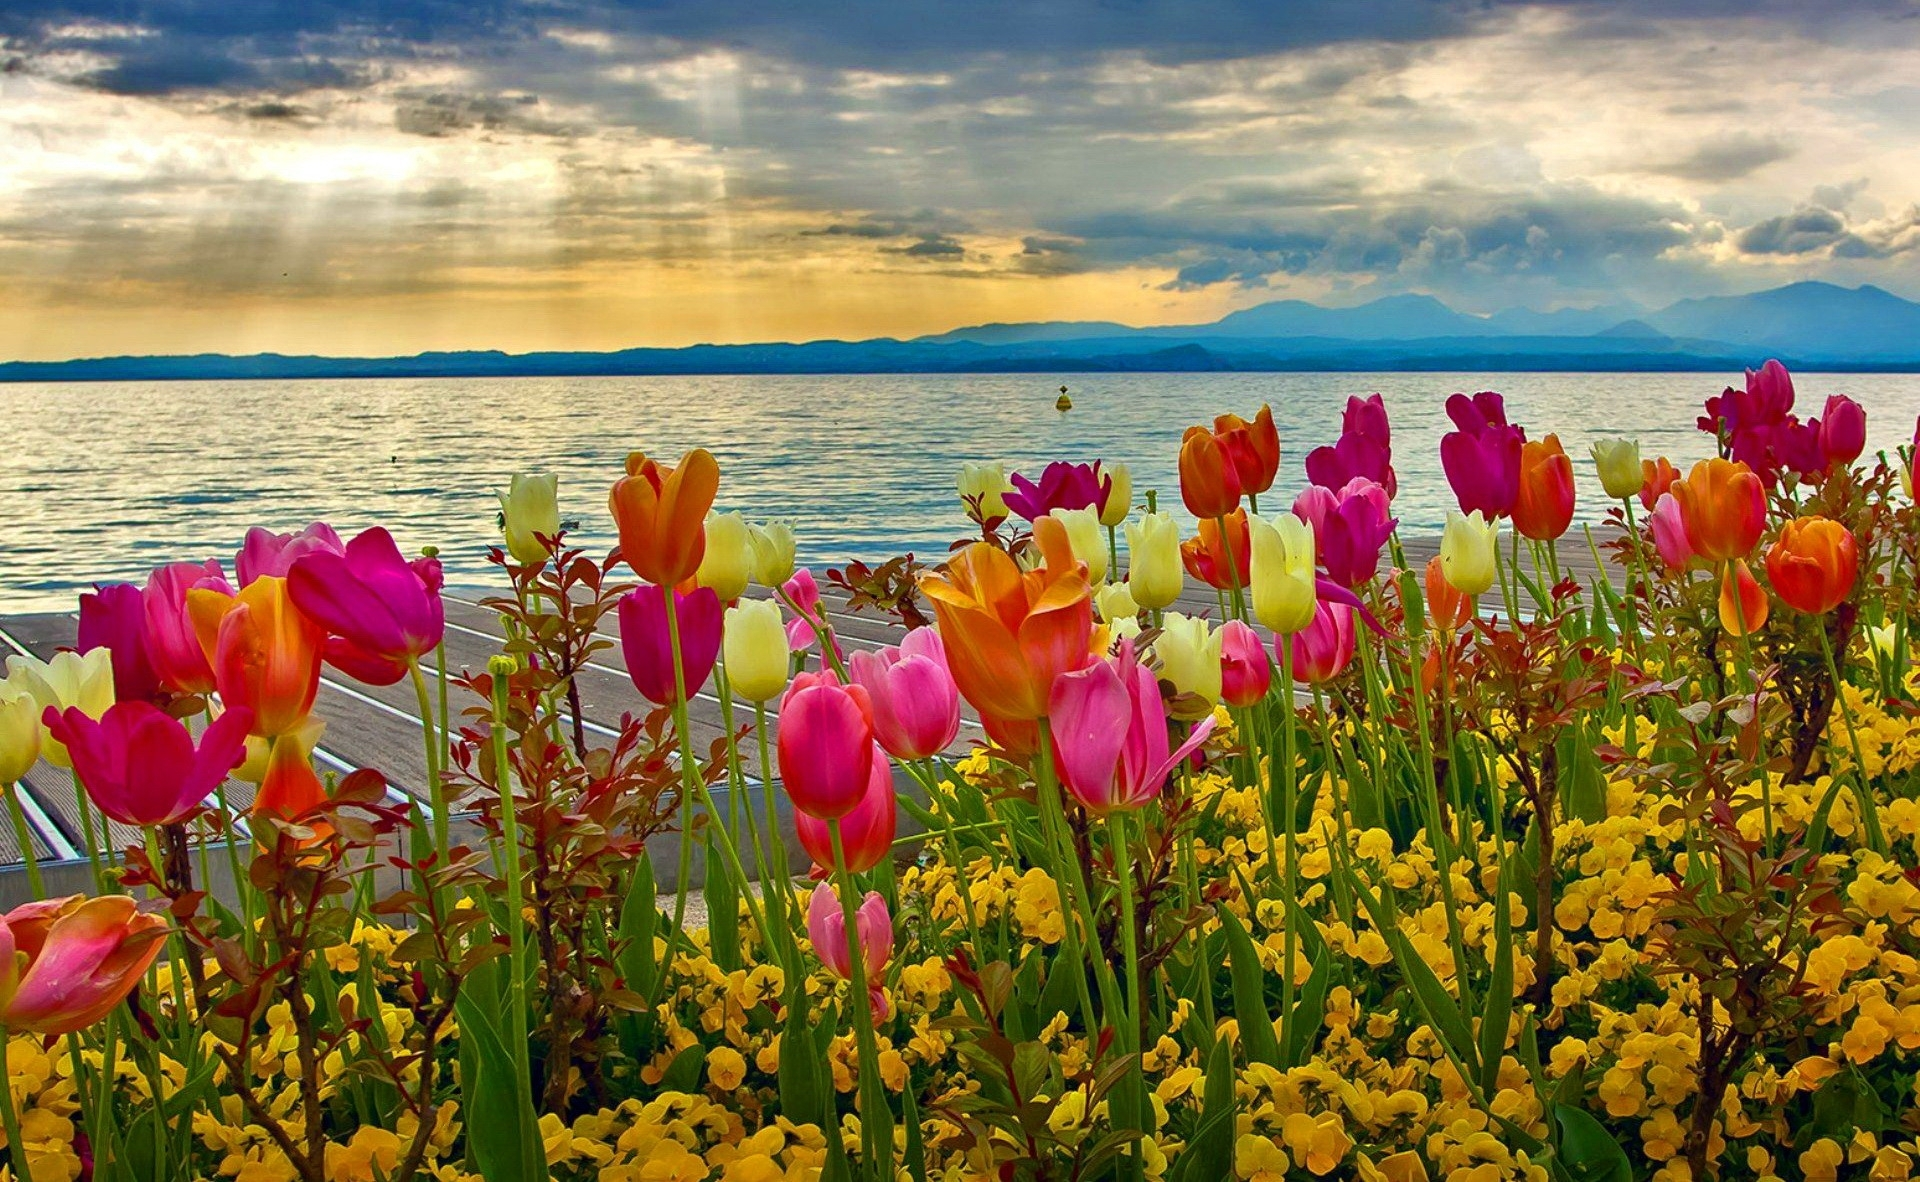 beautiful spring images download | pixelstalk